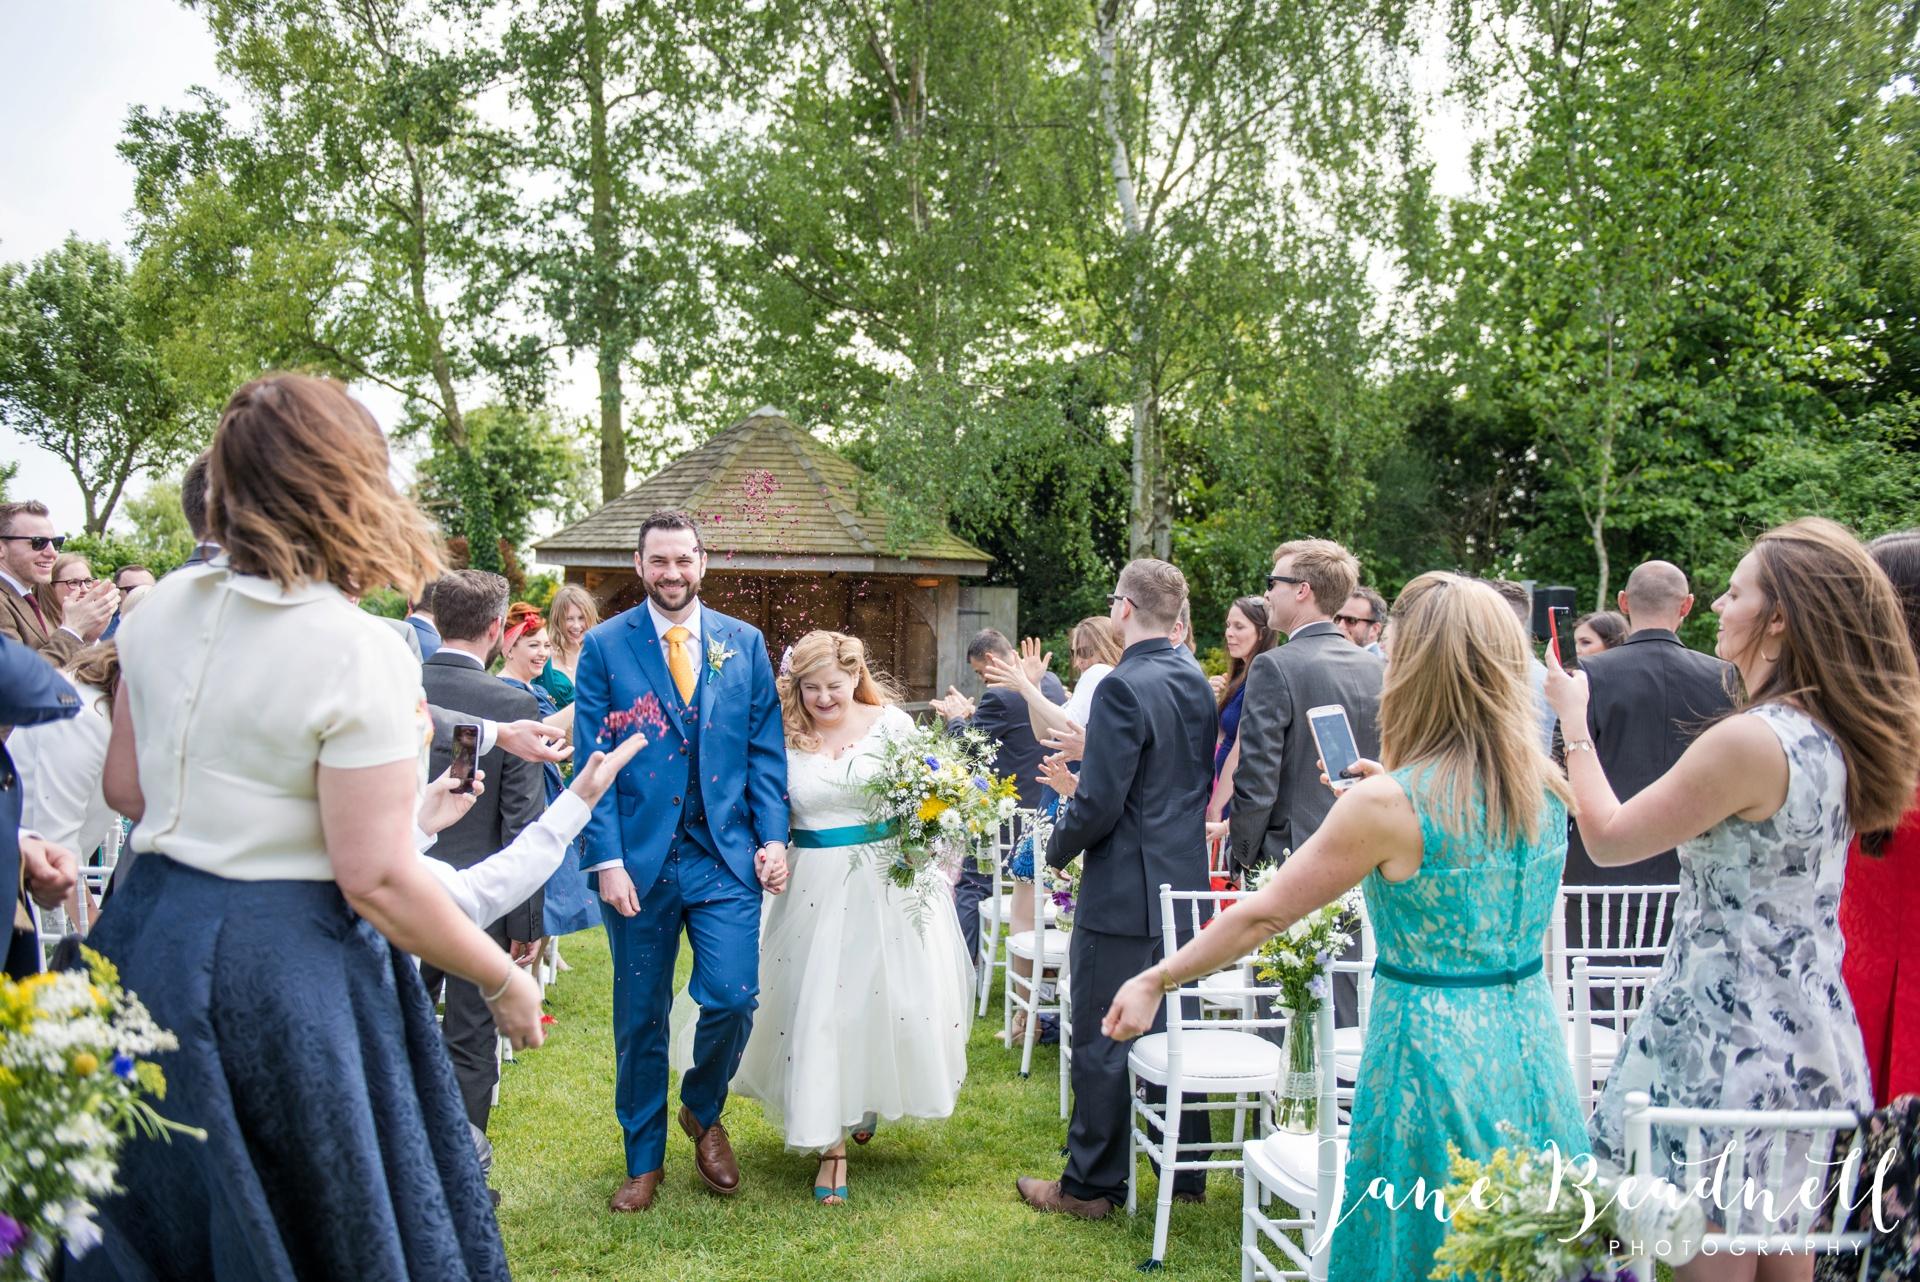 South Farm Wedding photography Hertfordshire by Jane Beadnell Photography fine art wedding photographer_0080